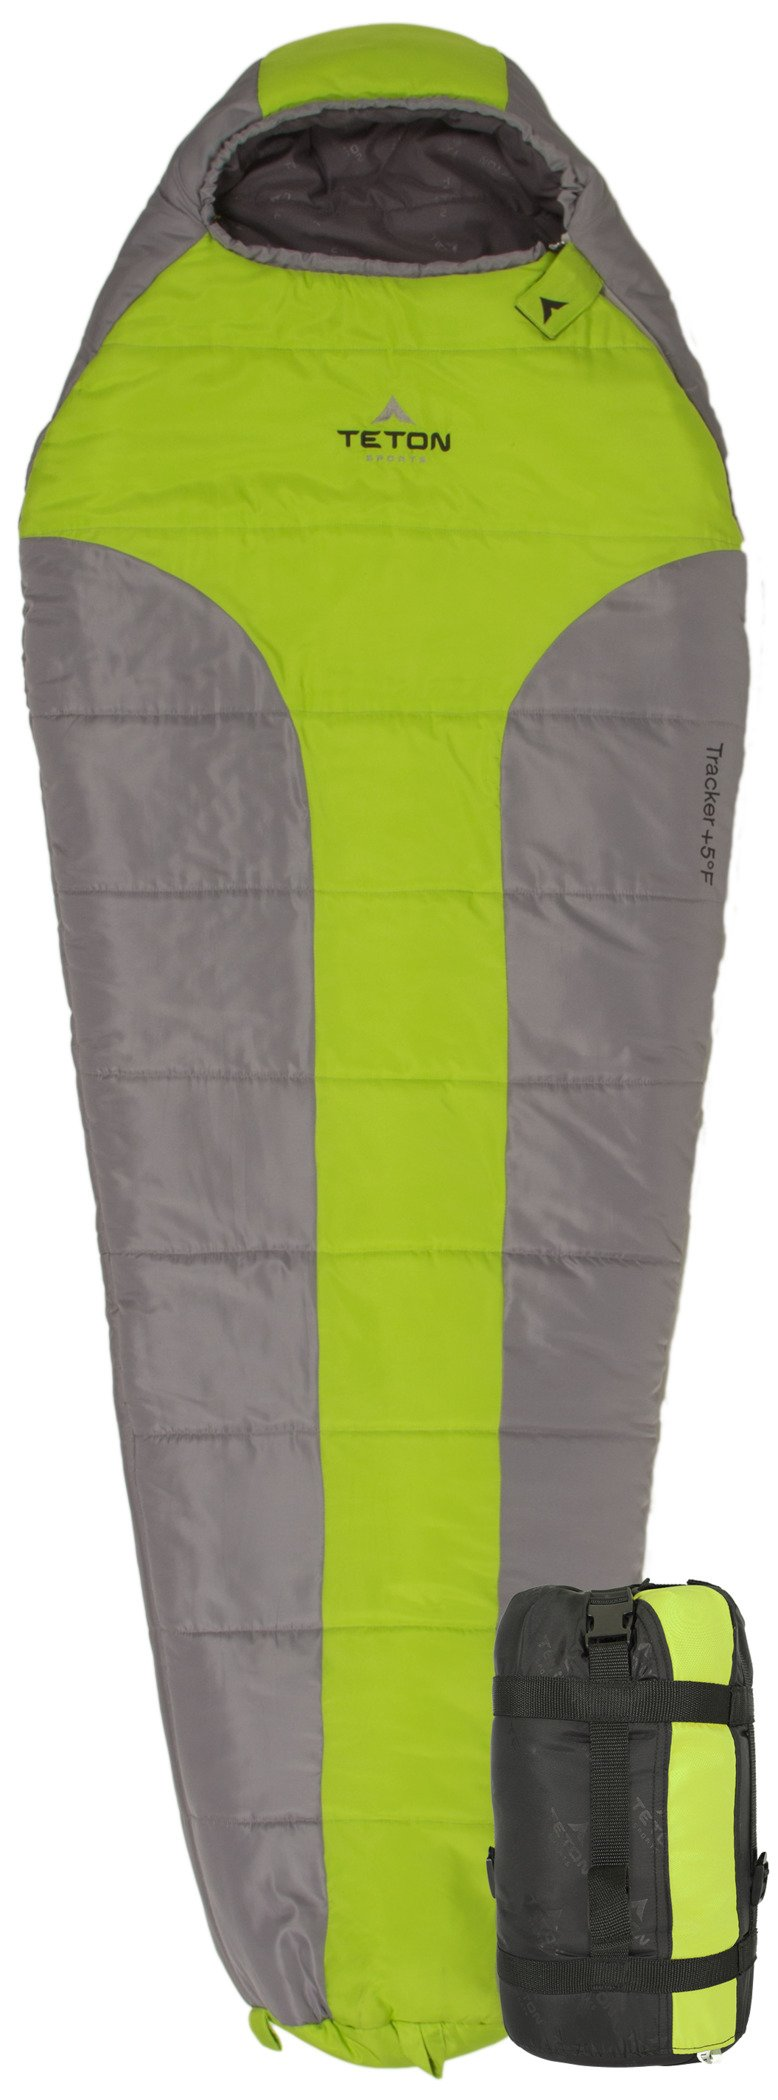 TETON Sports Tracker Ultralight Mummy Sleeping Bag; Lightweight Backpacking Sleeping Bag for Hiking and Camping Outdoors; All Season Mummy Bag; Sleep Comfortably Anywhere; Green/Grey